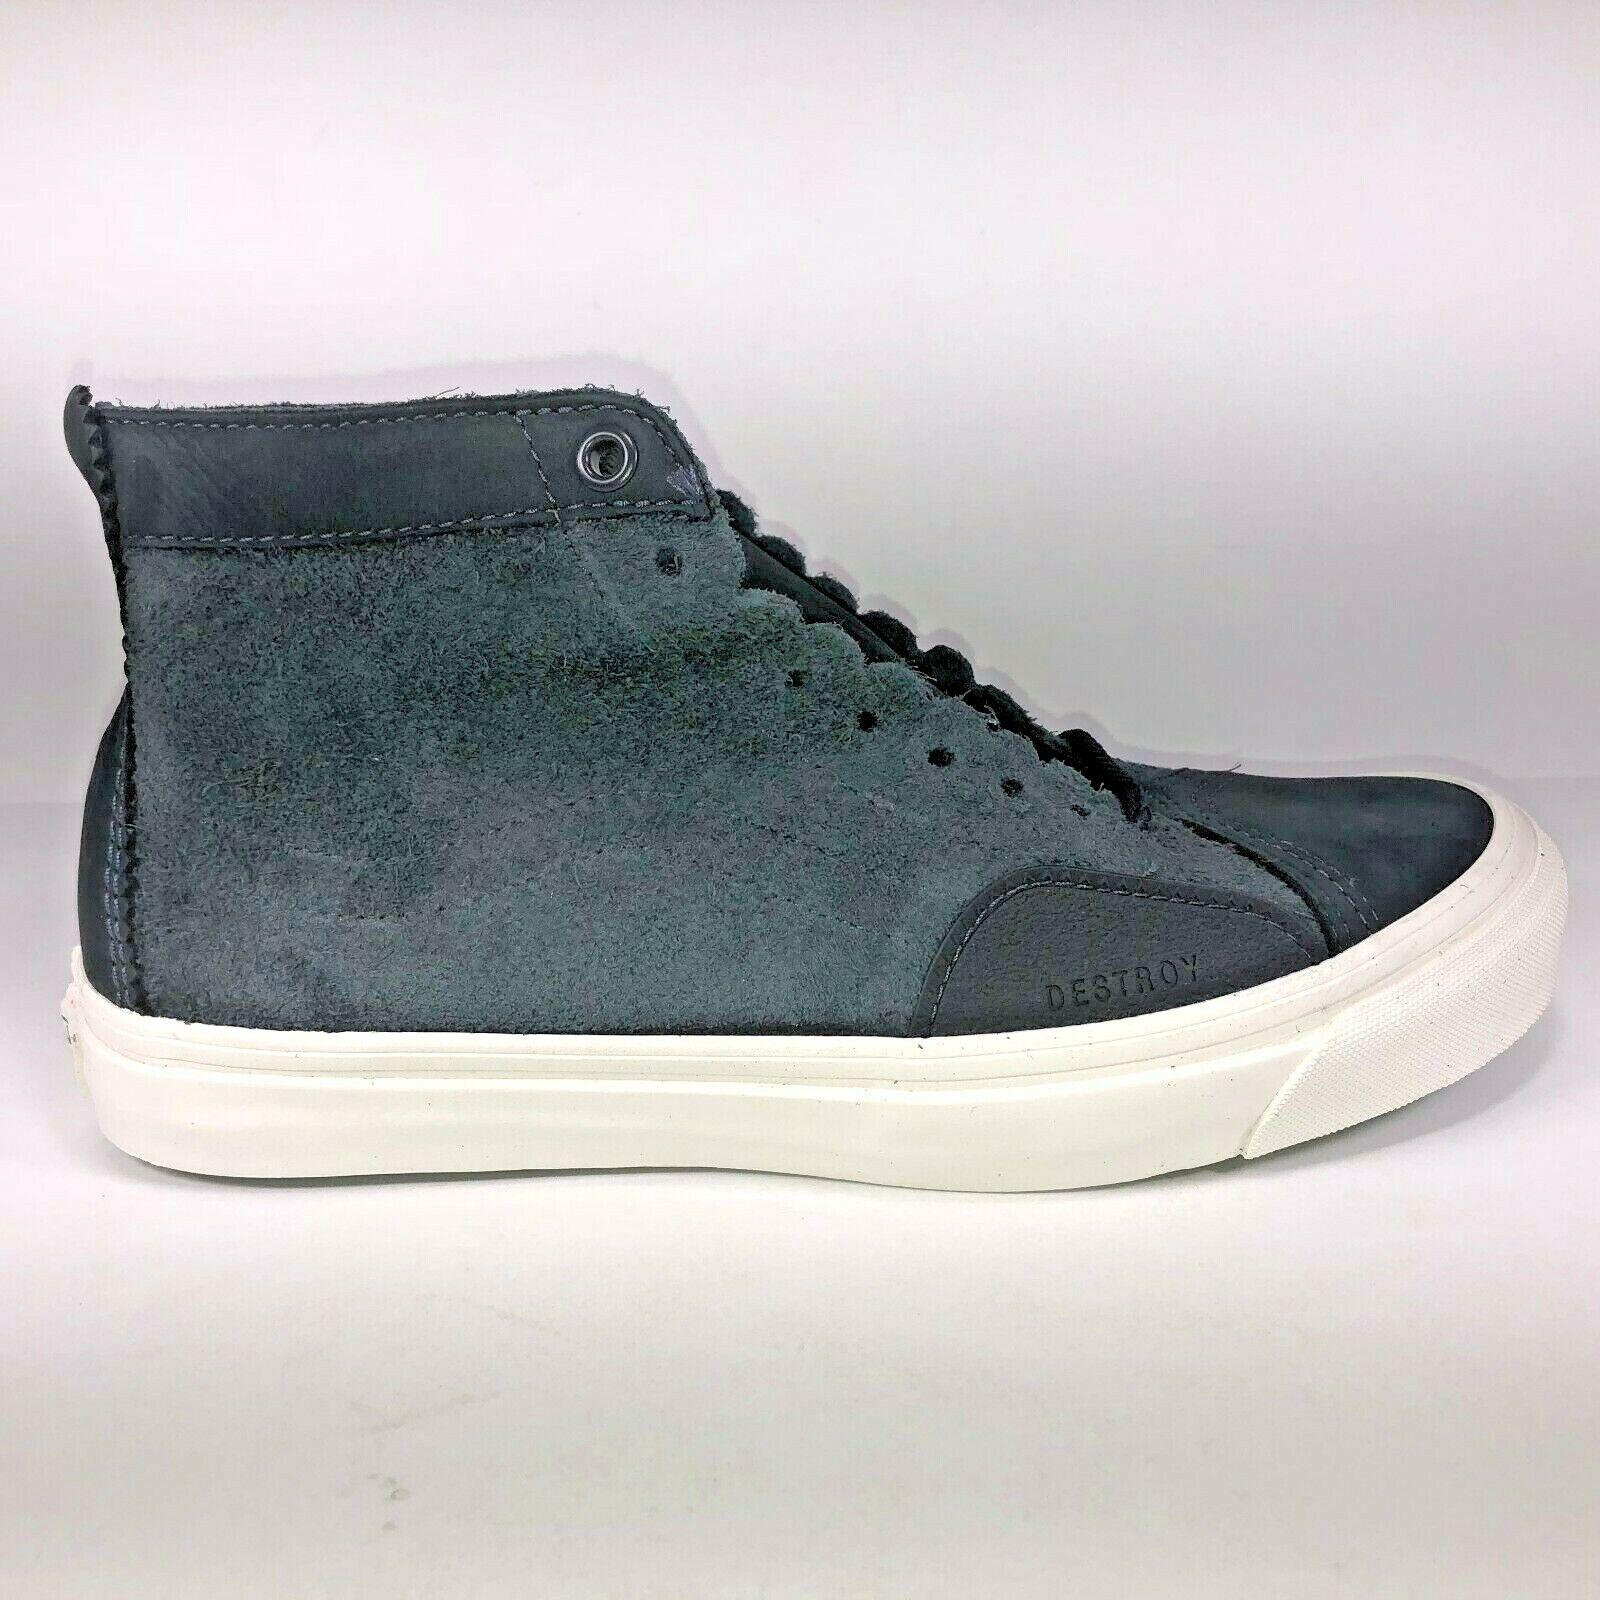 VANS Taka Hayashi SK8 Skool LX Nubuck bluee Graphite Sneaker VN0A38H2N9X Size 8.5